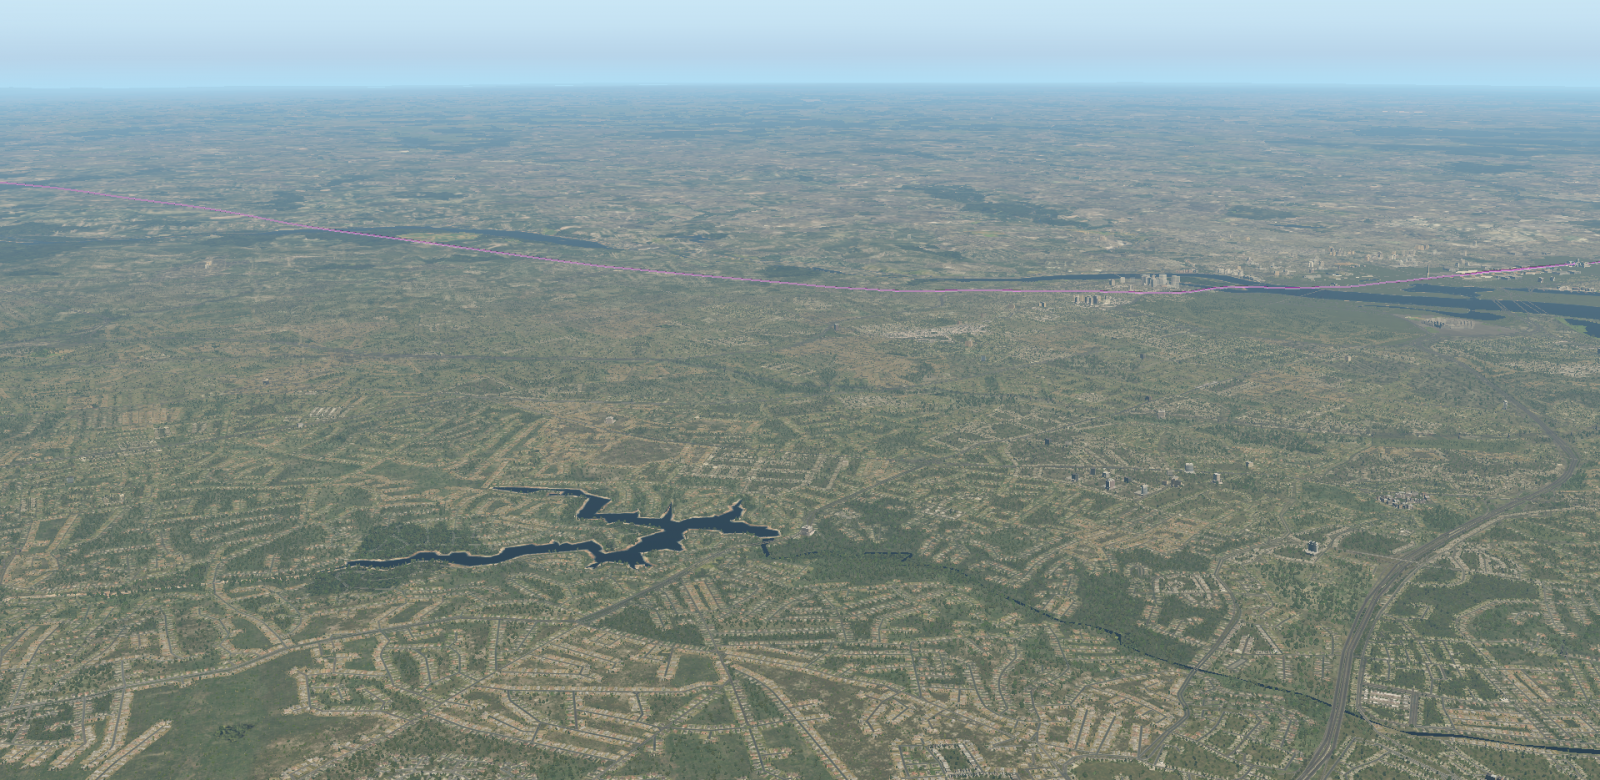 93 flight path.PNG